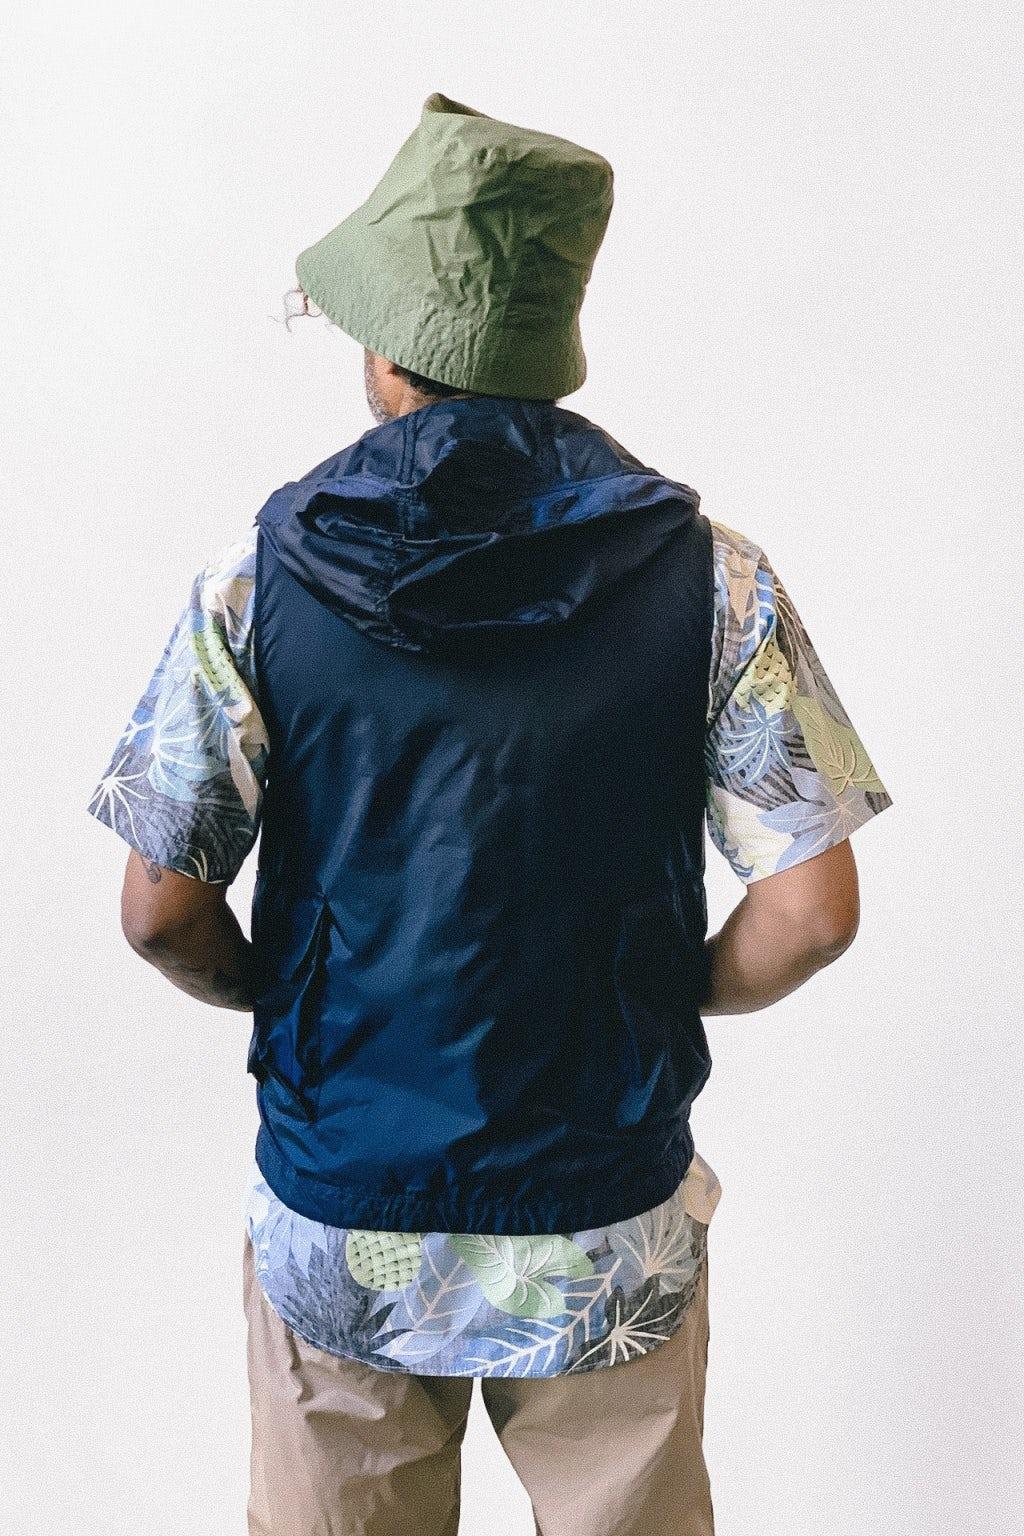 Engineered Garments Bucket Hat Olive Cotton Ripstop